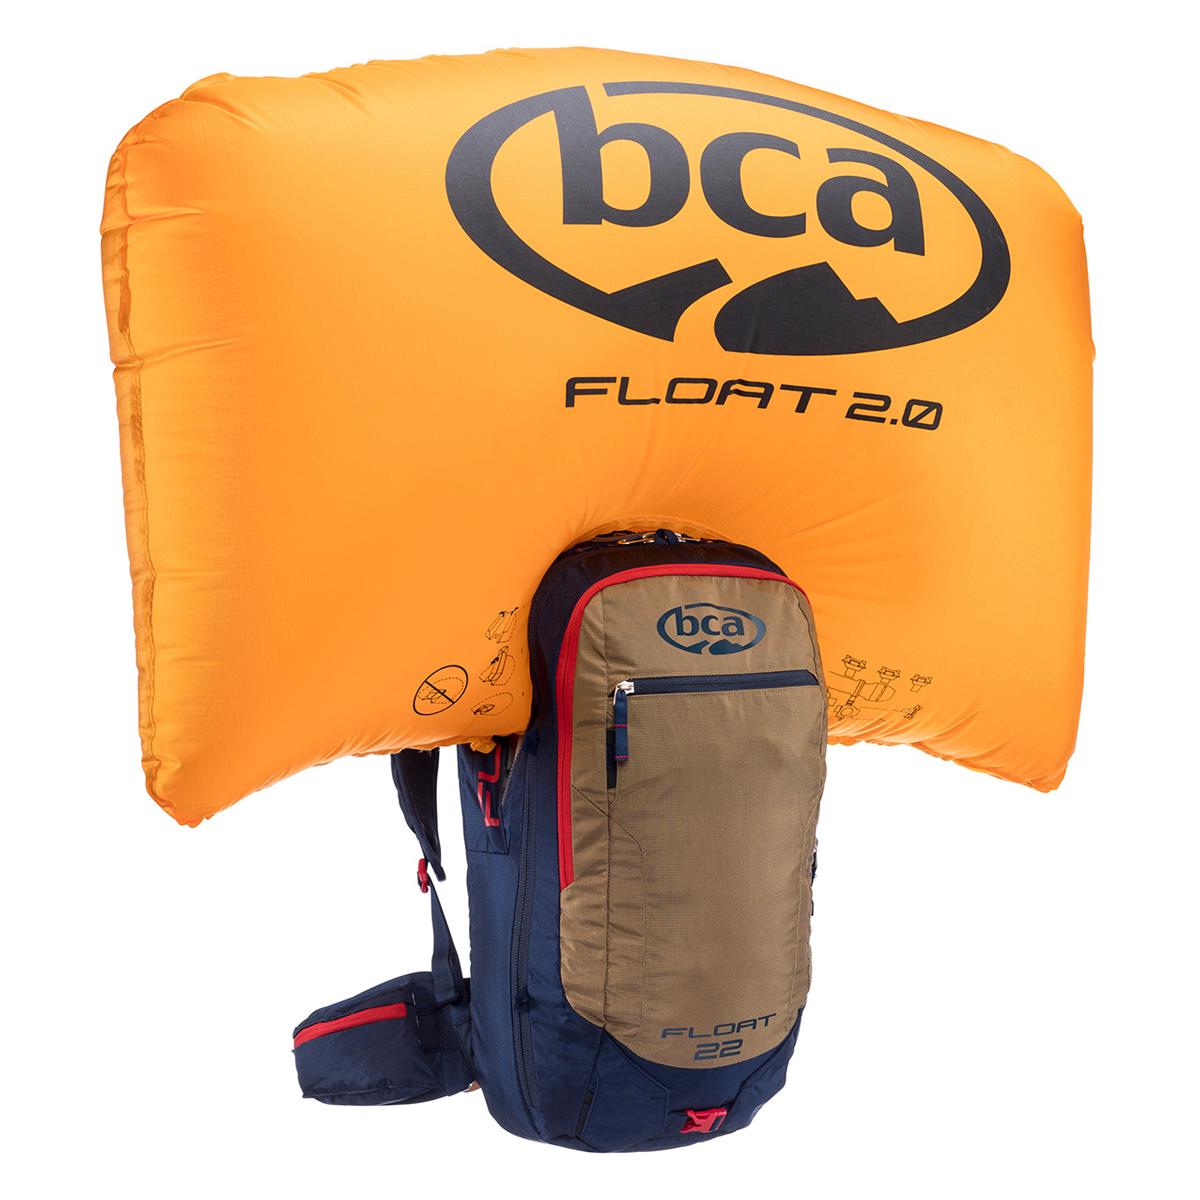 BCA_Float22_avalanche_airbag_navyblue-deploy_1200x1200.jpg